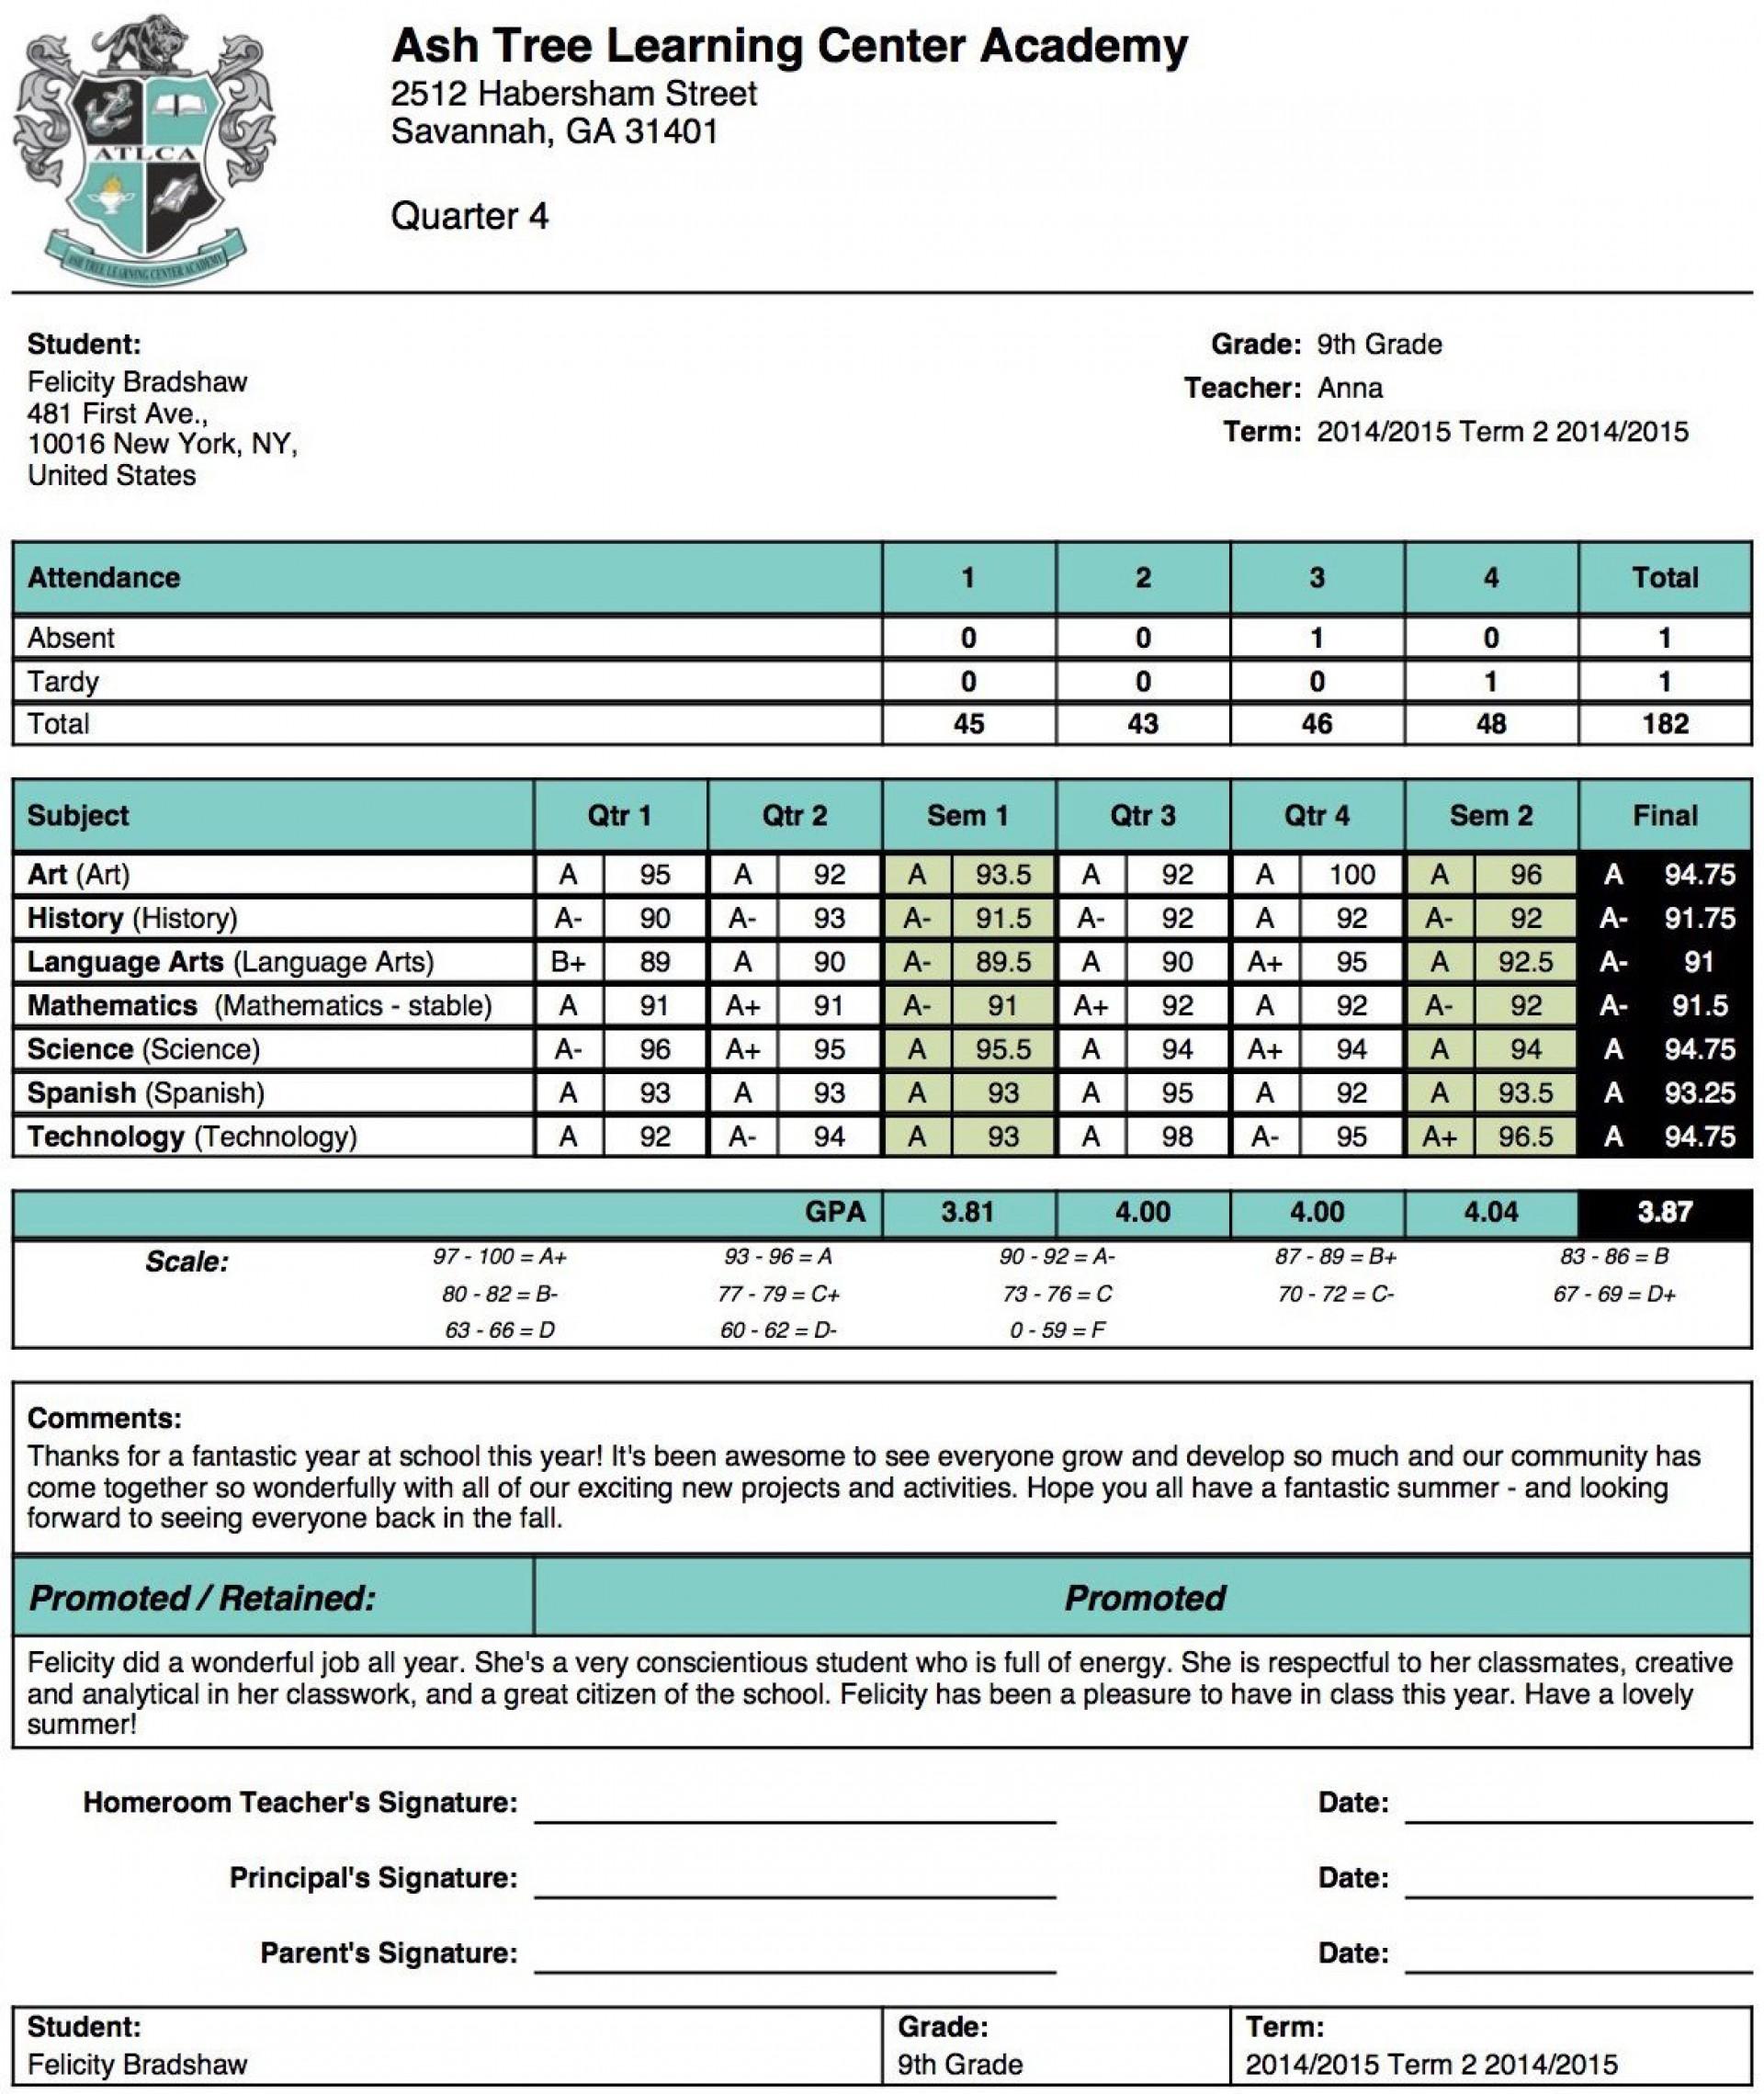 002 Marvelou Junior High School Report Card Template Design 1920